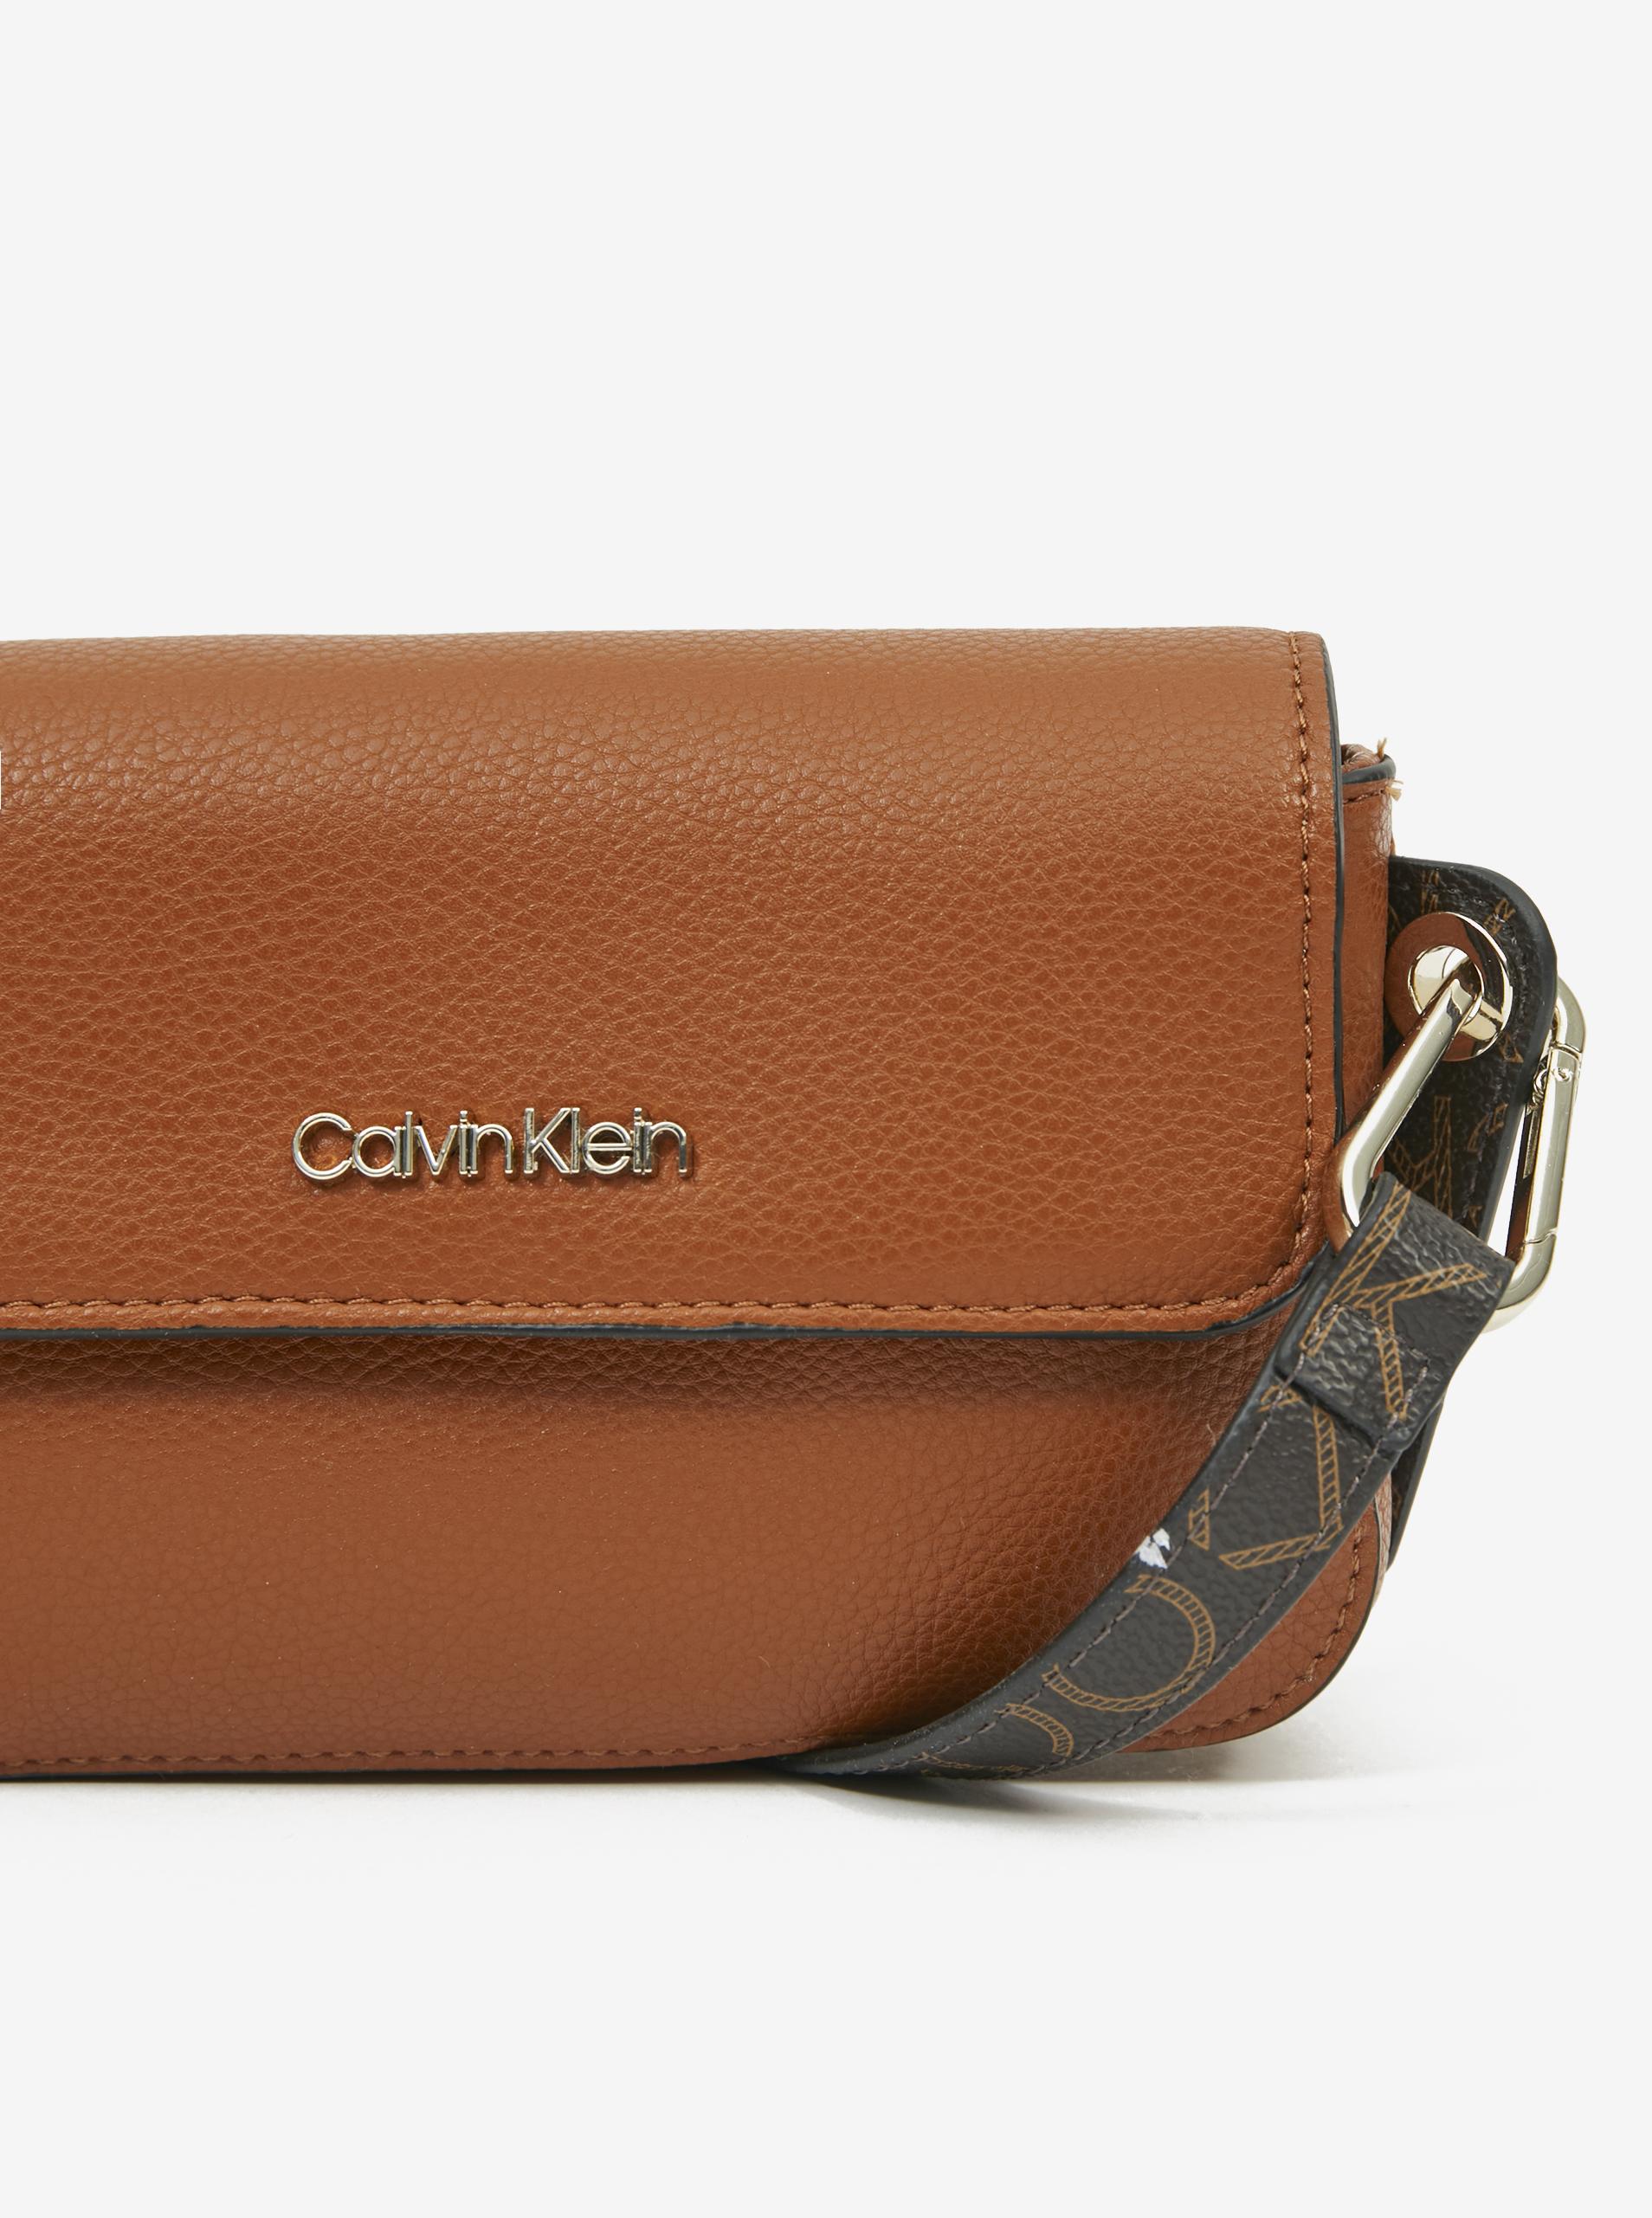 Calvin Klein rjava crossbody torbica